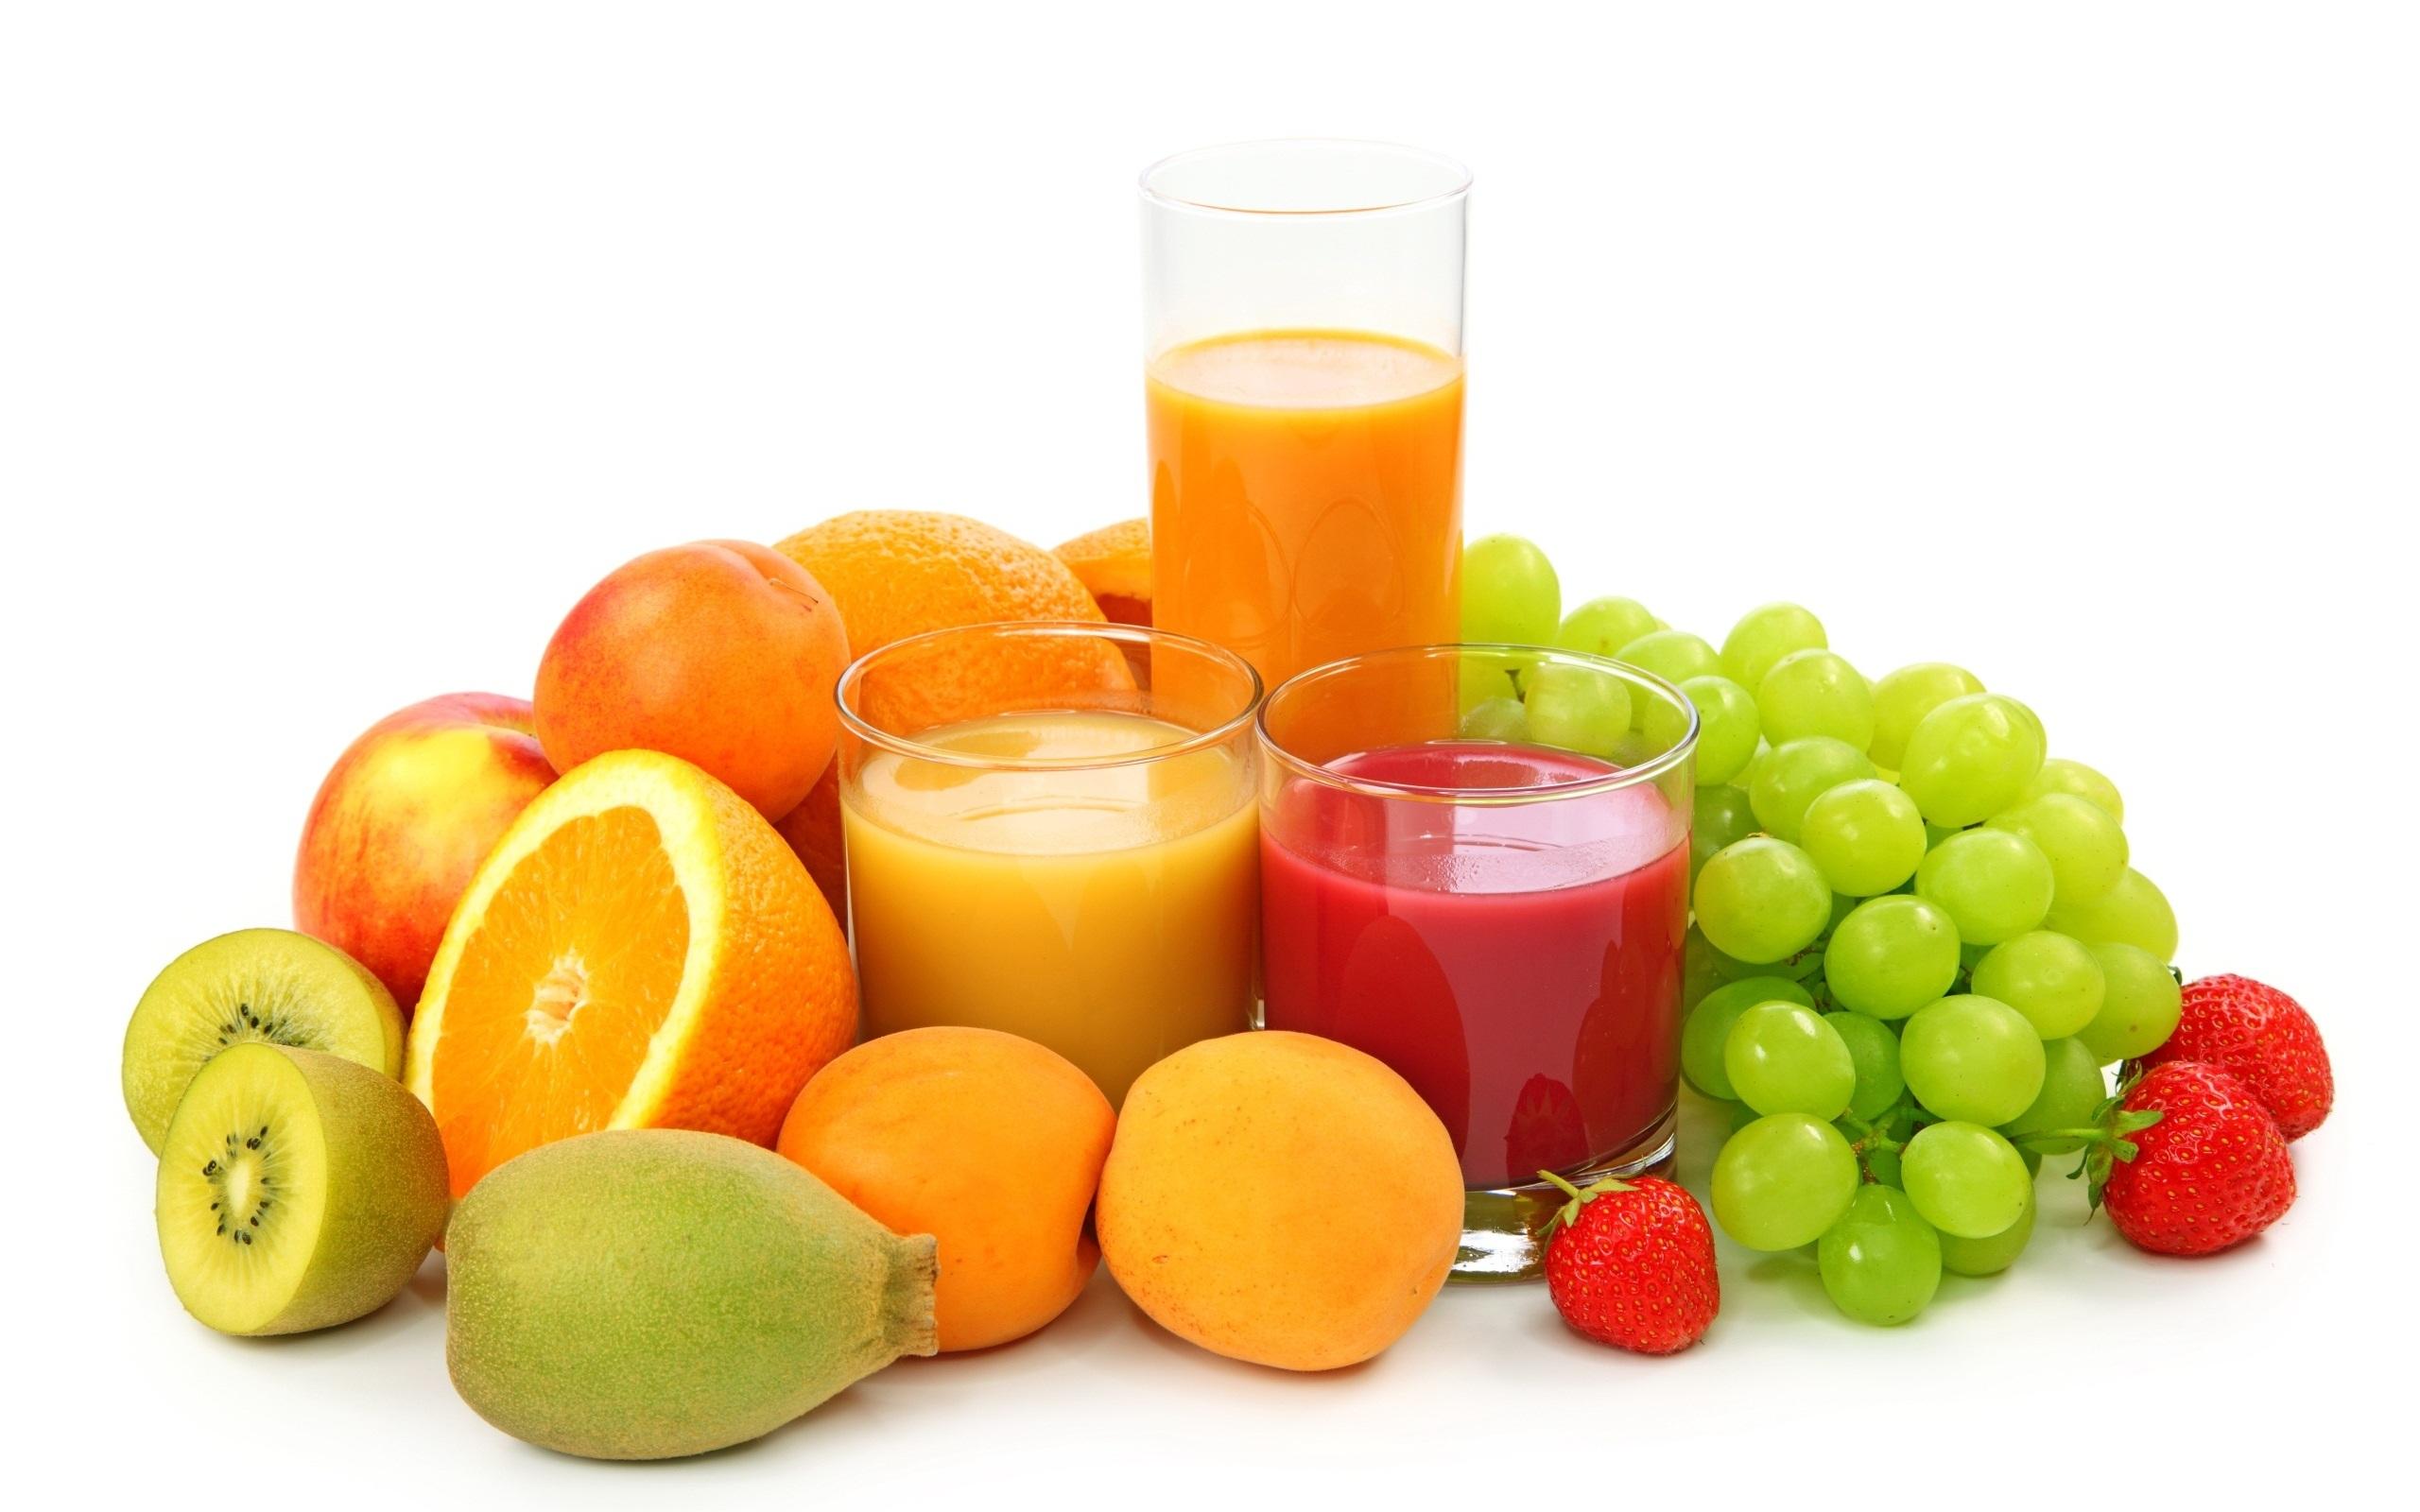 Or orange fruit hd wallpaper - Fruits Wallpapers Hd Fresh Fruits Hd Wallpapers Free Hd Wallpapers